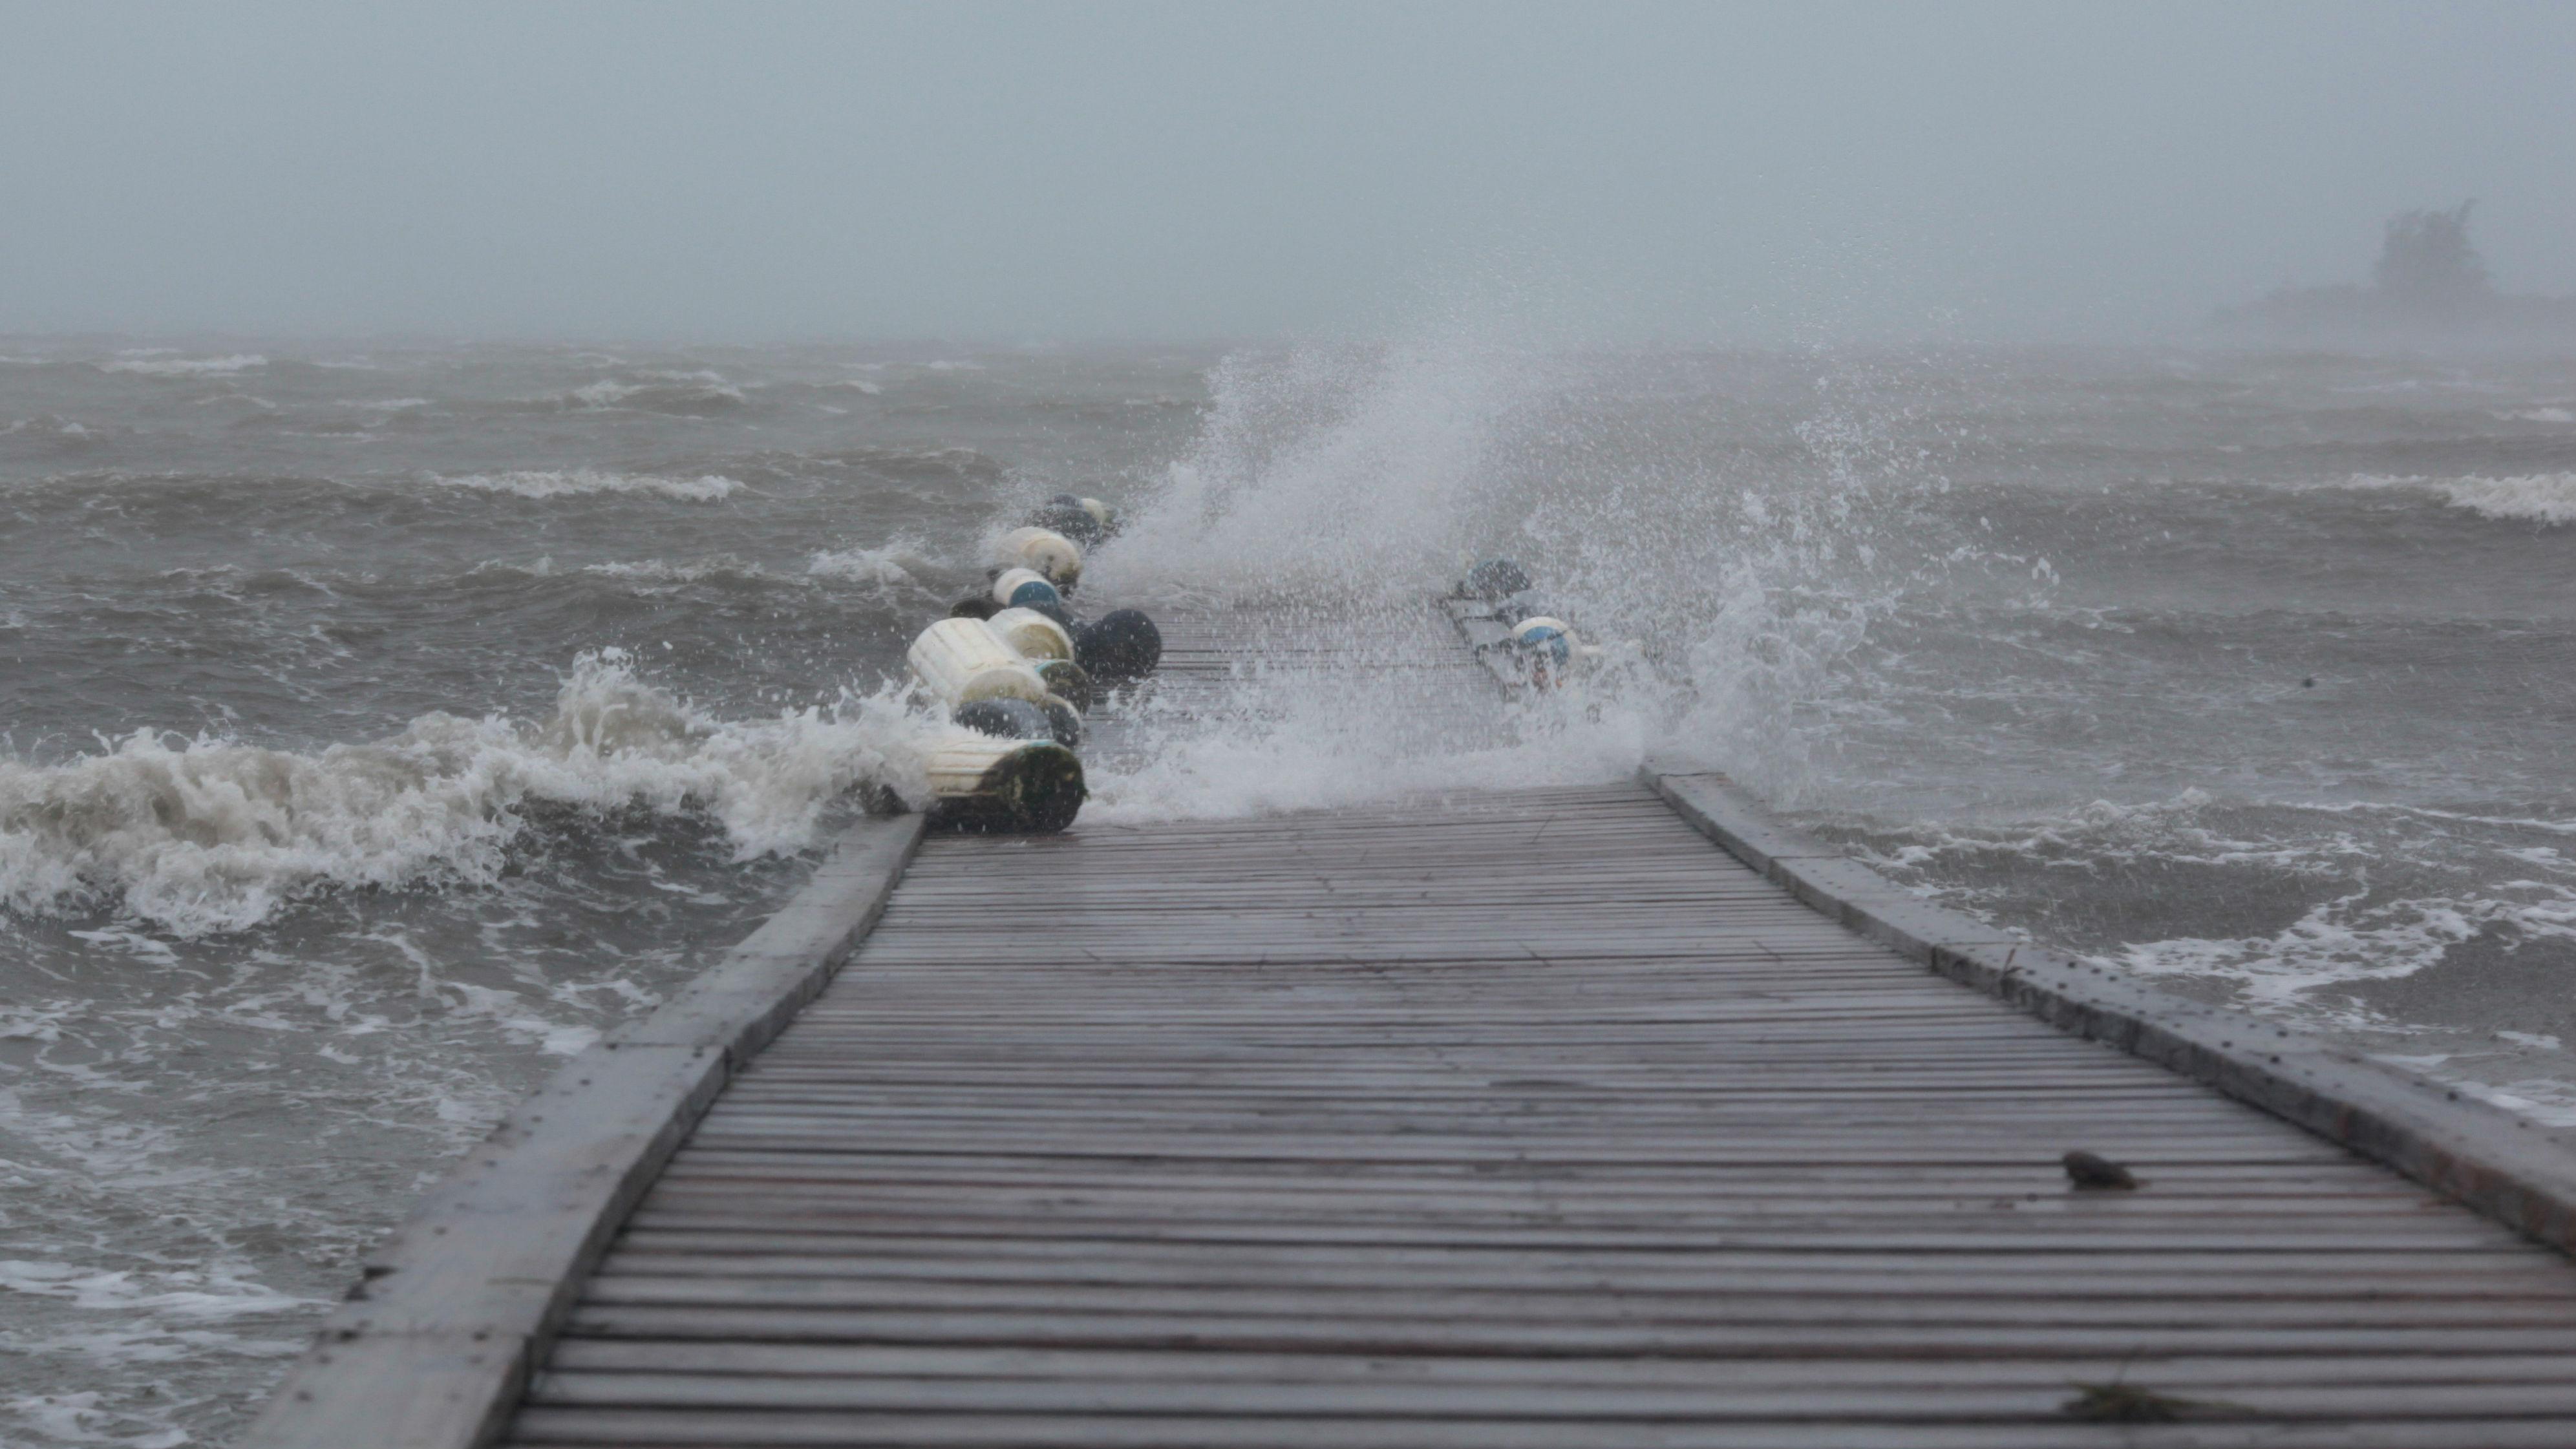 Waves break over a dock as Hurricane Irma slammed across islands in the northern Caribbean in Fajardo, Puerto Rico.